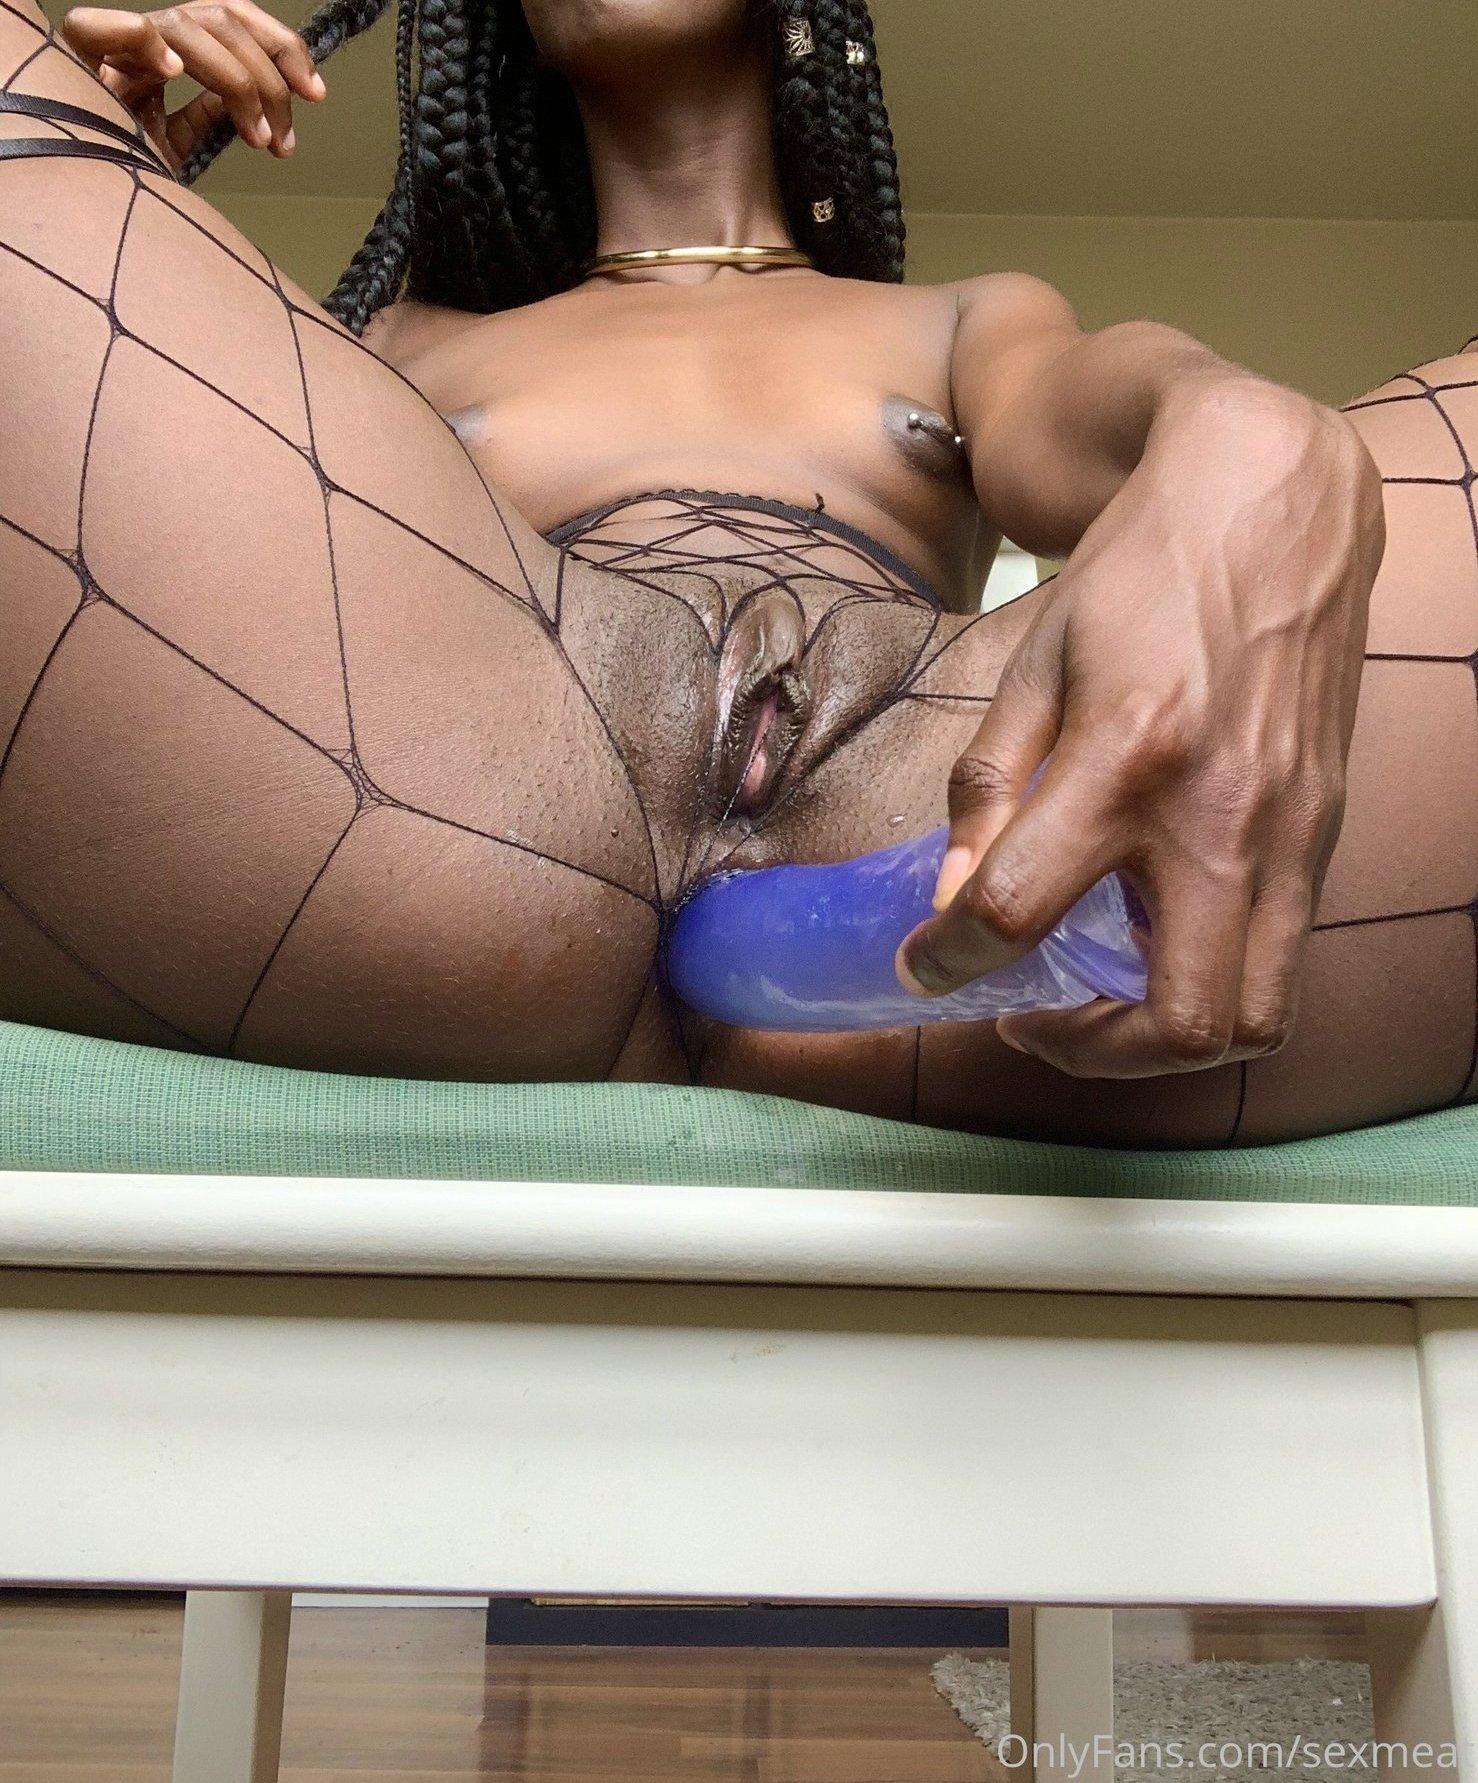 Sexmeat Sluttysexmeat Onlyfans Nude Leaks (39 Photos) Nudostar0018